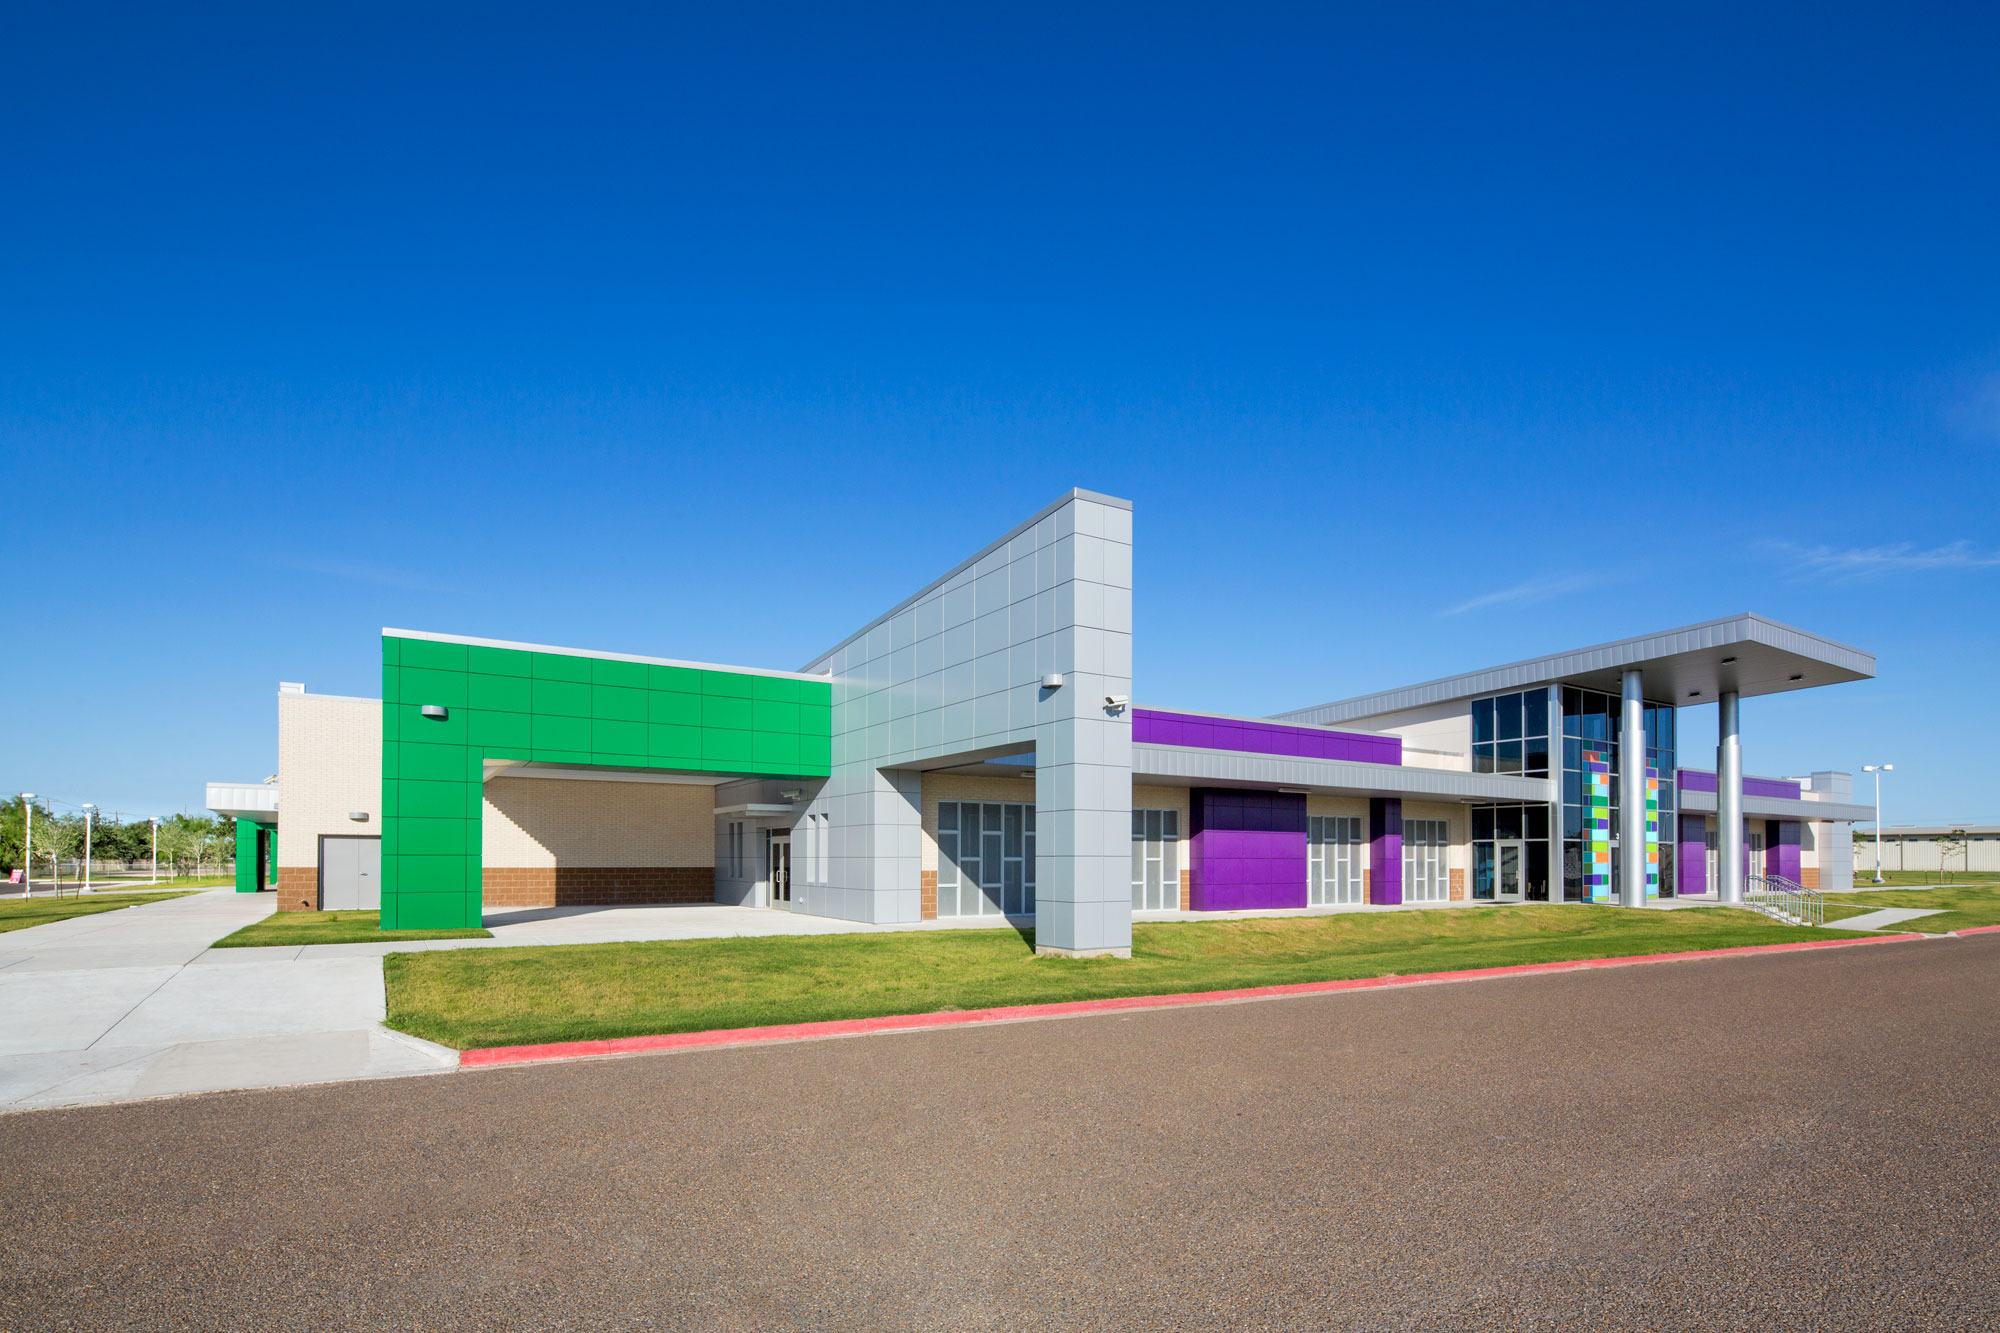 Alucobond, STC Technology Campus, EGV Architects, Bowman Distributing, Photography John Faulk